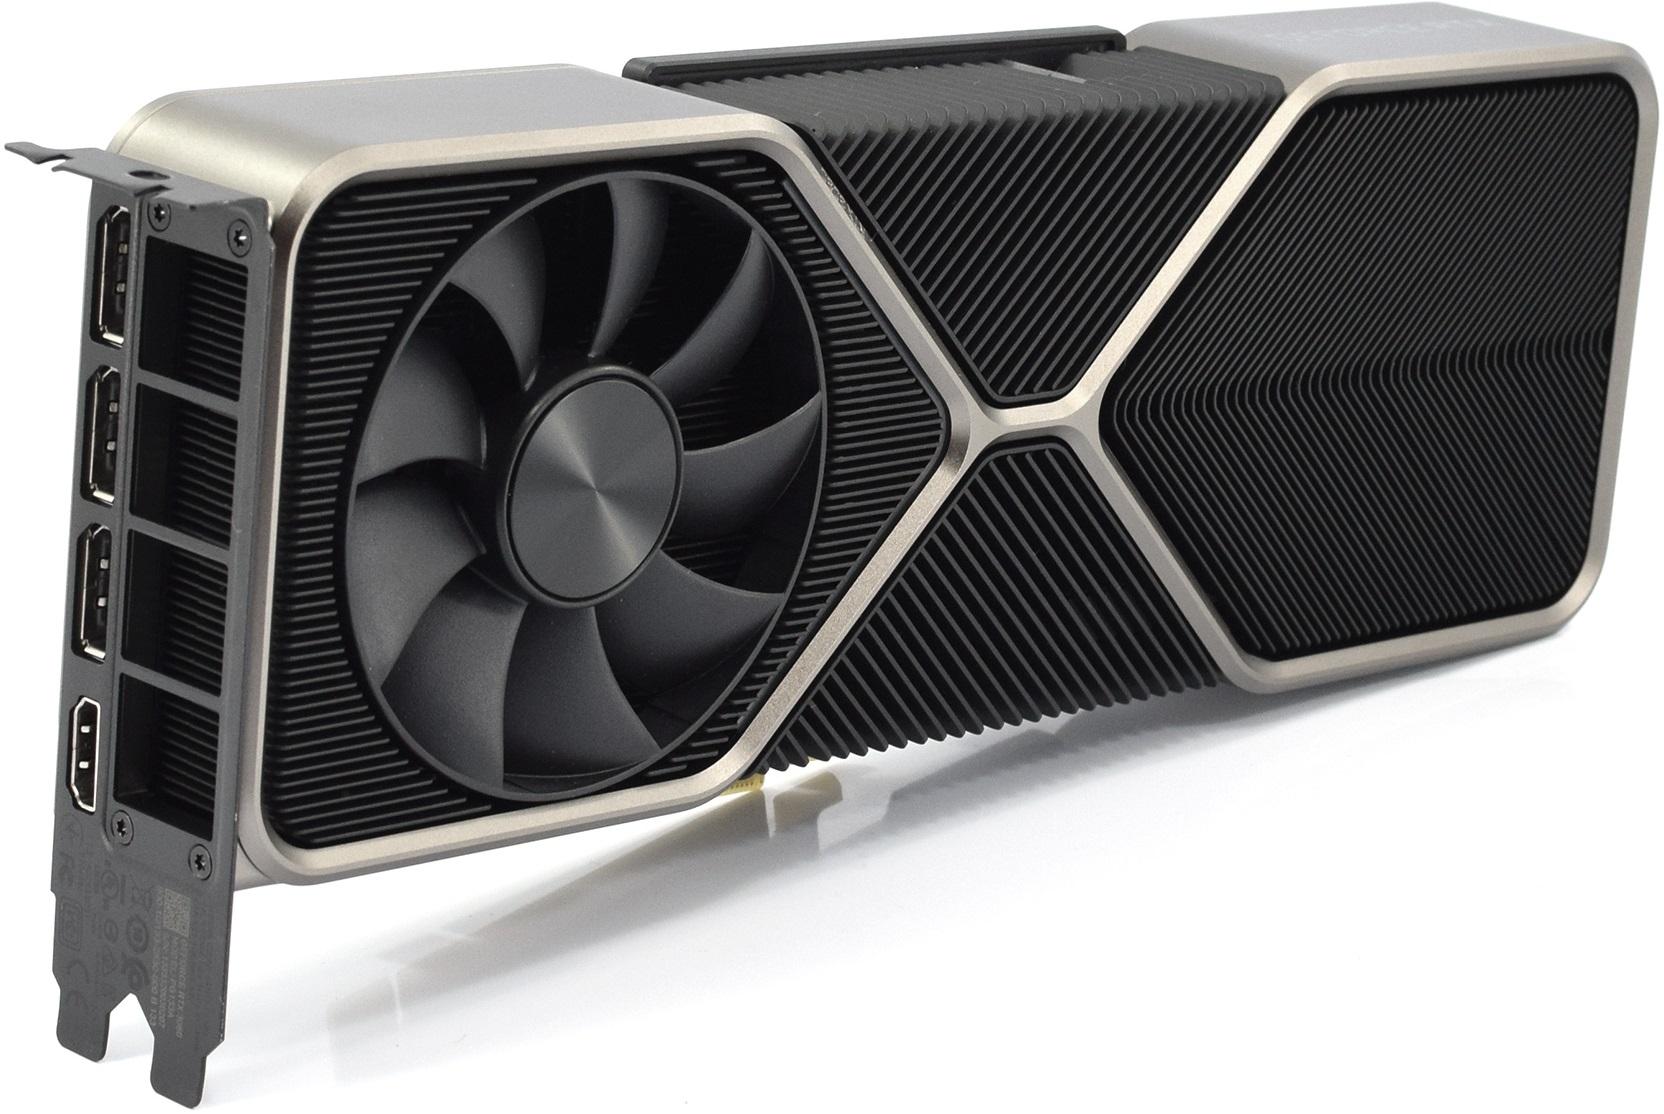 Nvidia определилась с датой анонса GeForce RTX 3080 Ti и RTX 3070 Ti